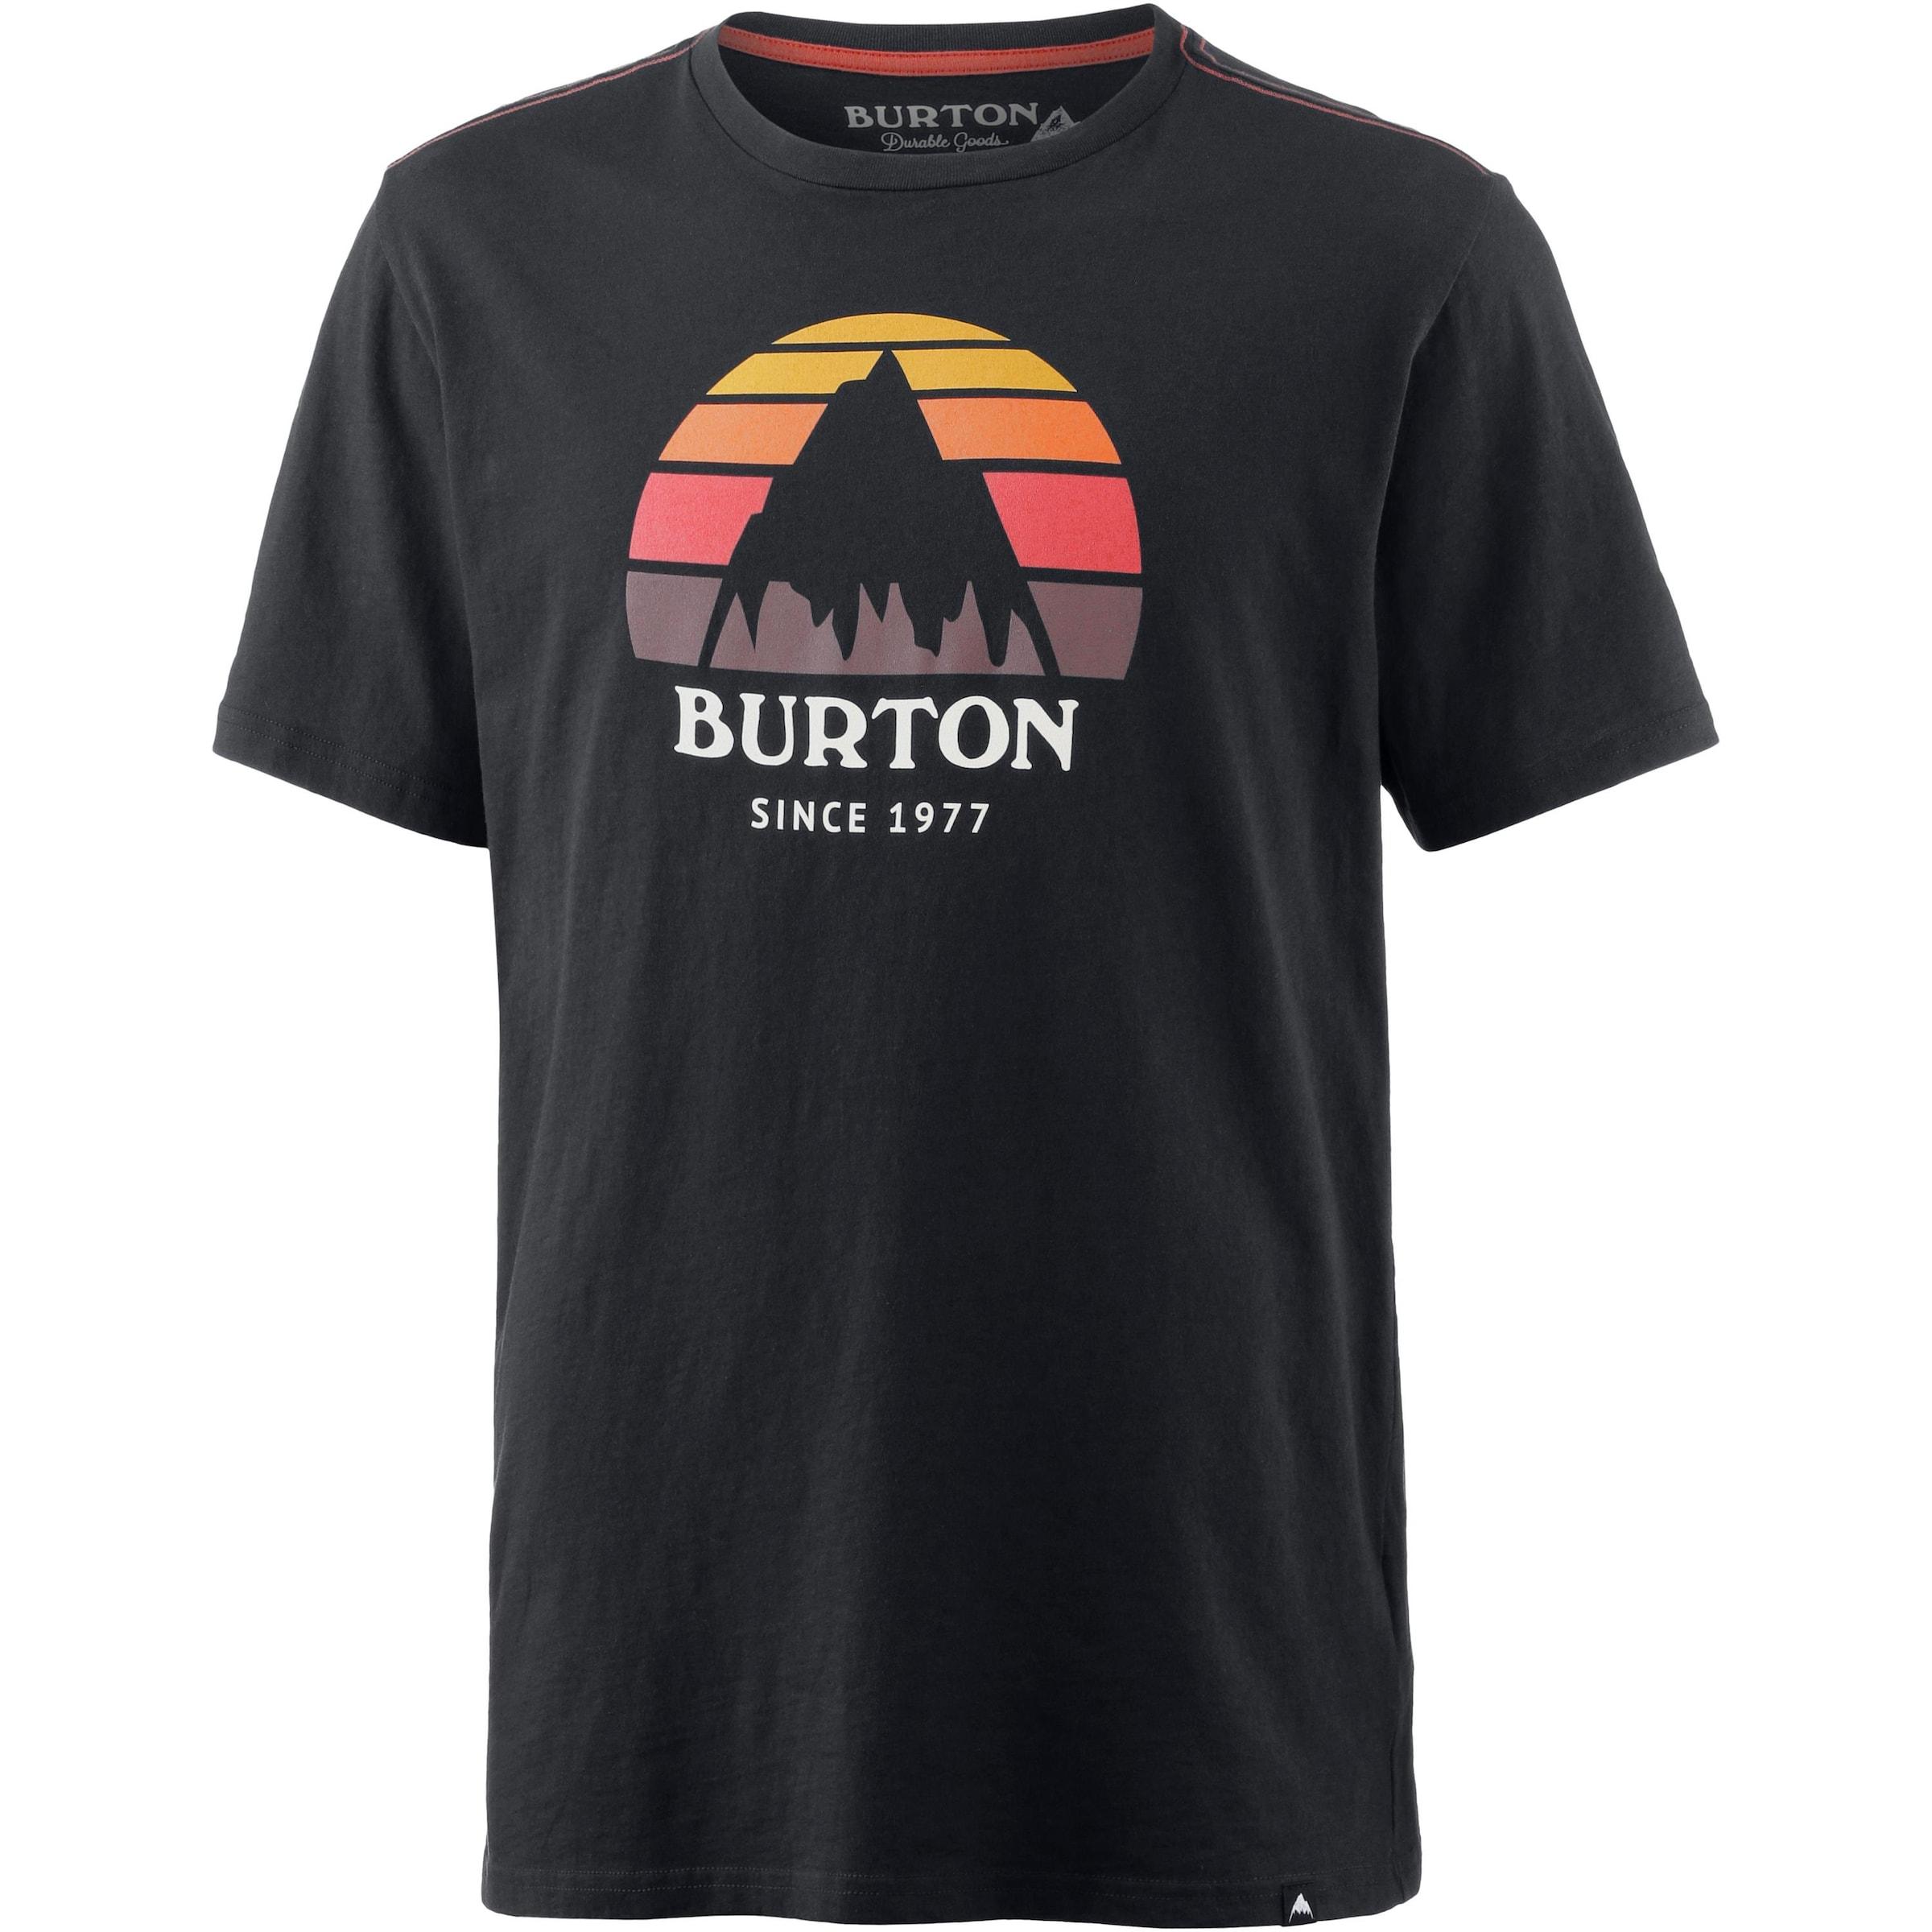 BURTON 'UNDERHILL' T-Shirt Abstand Rabatt 4WA8pBW